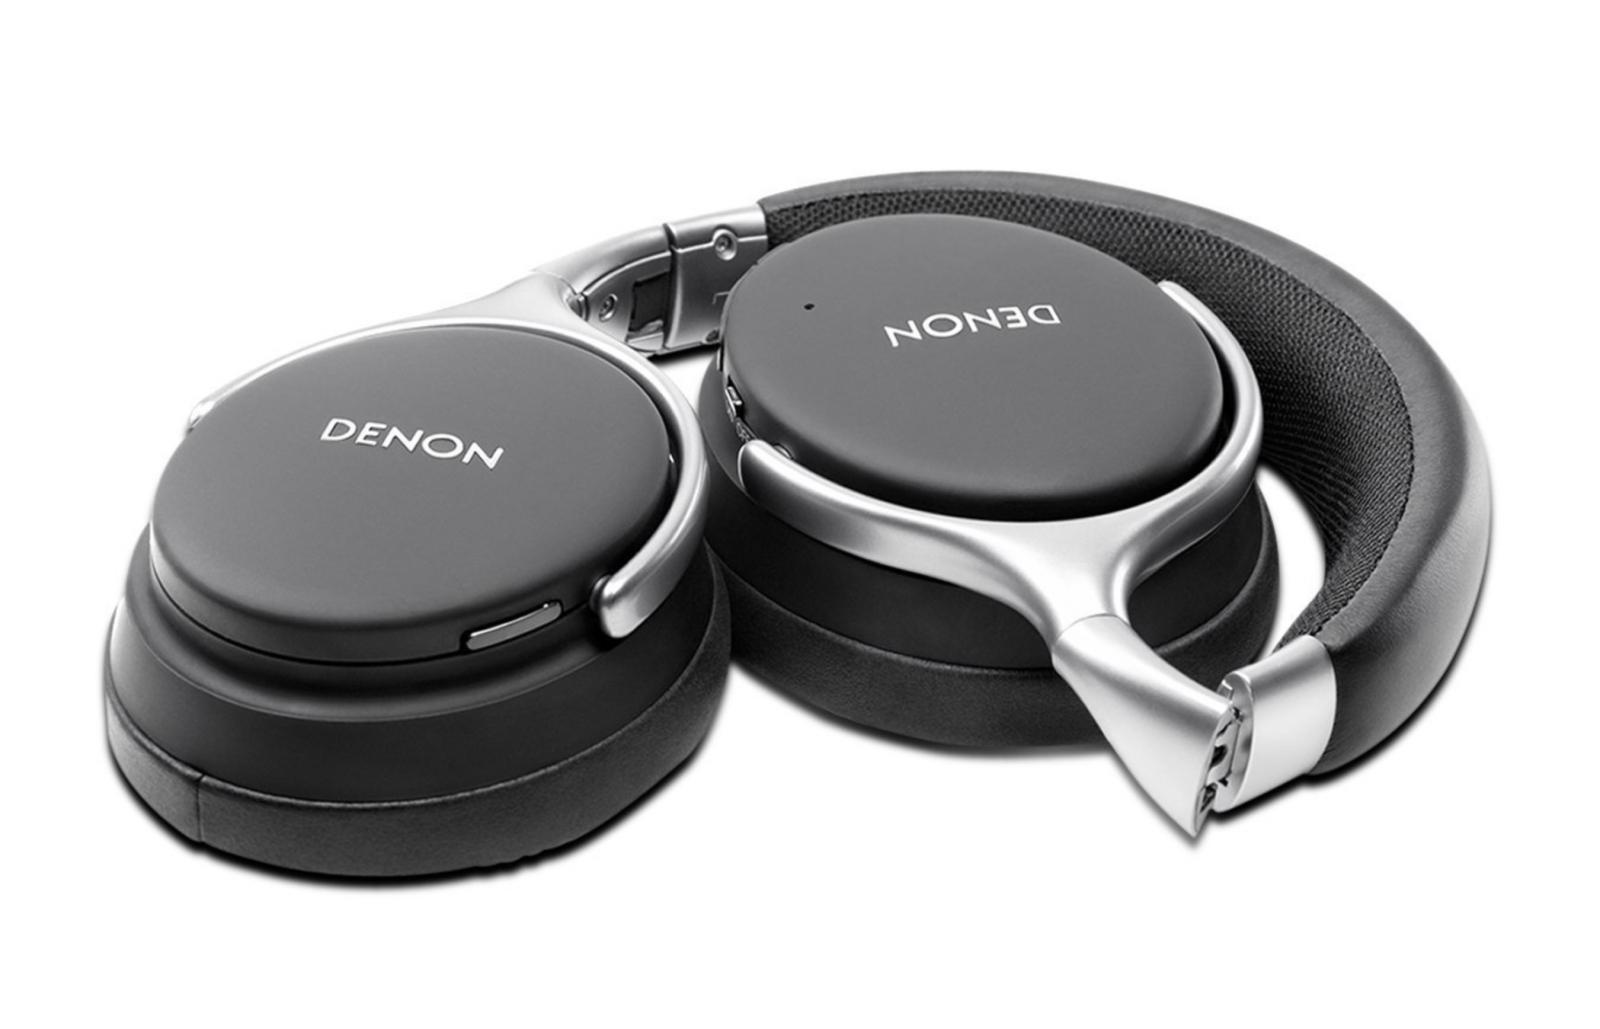 Denon AH-GC20 review image